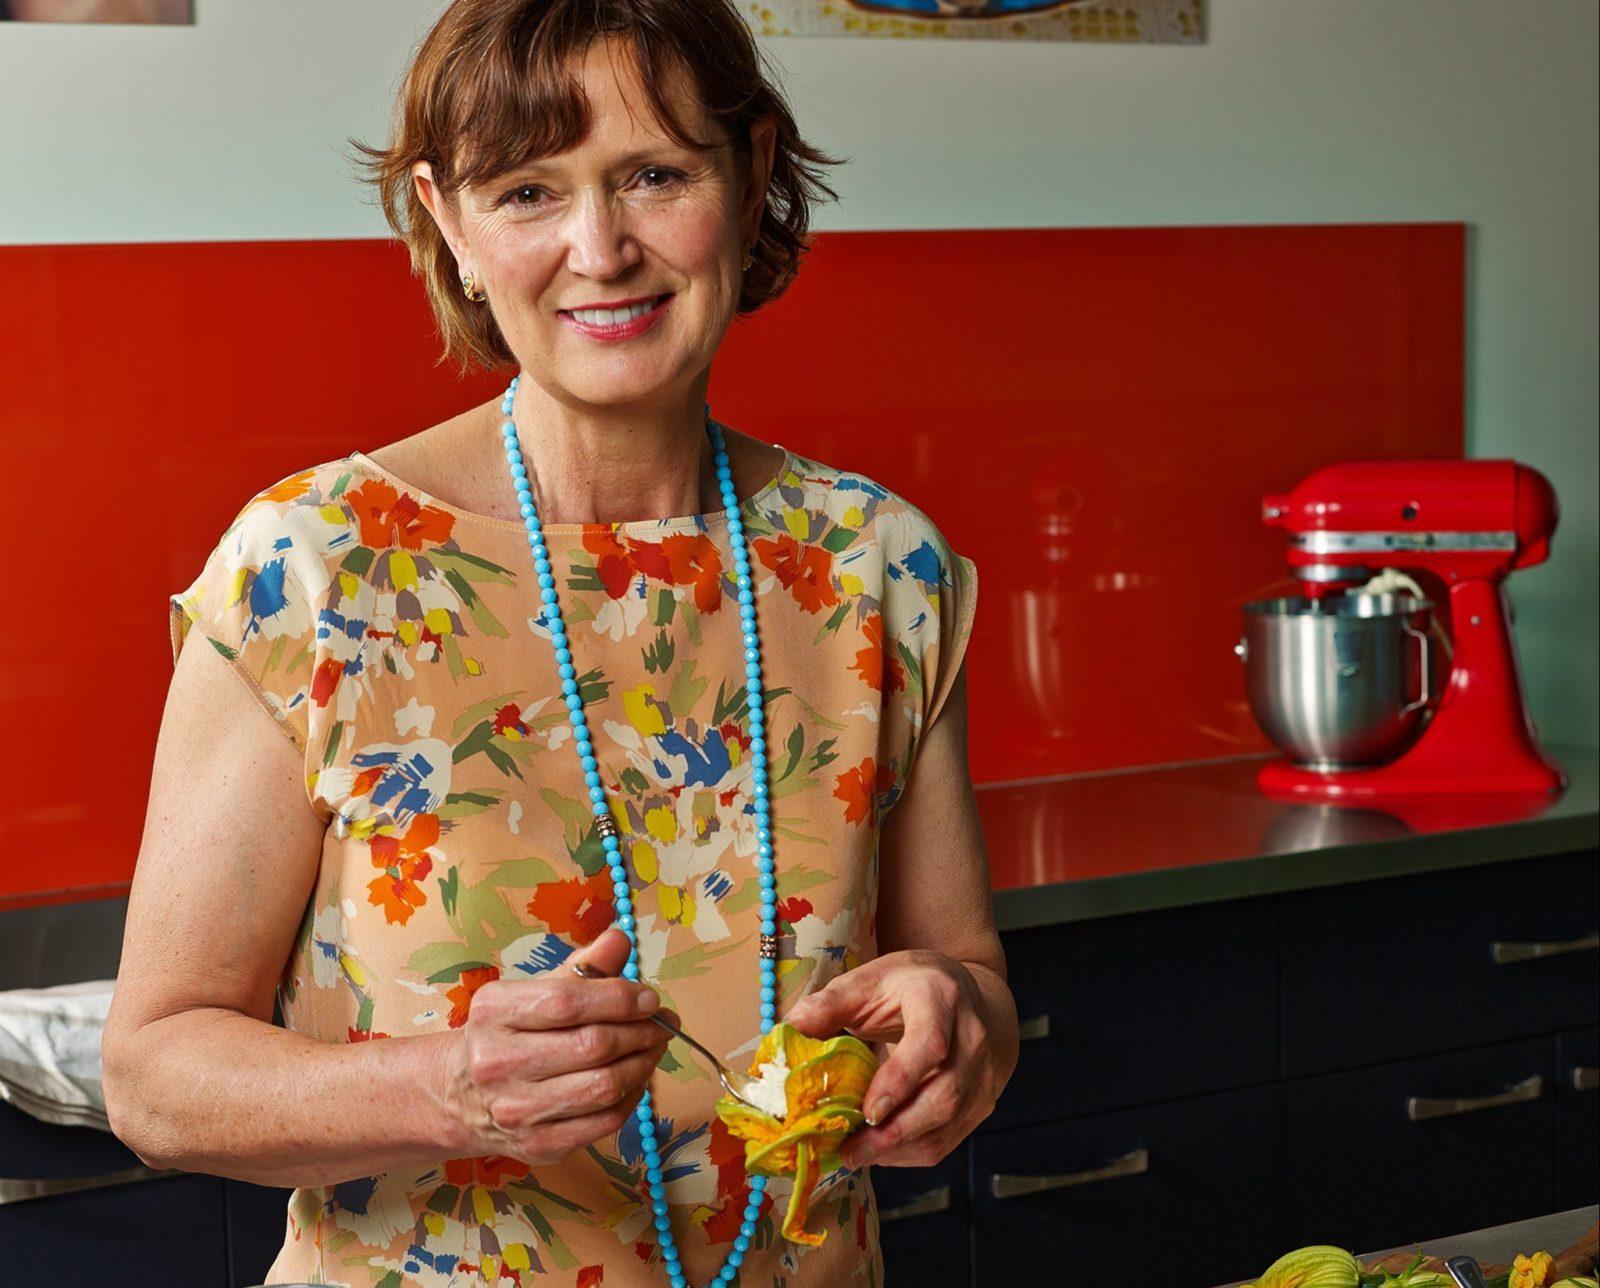 Katrina preparing stuffed Zucchini Flowers